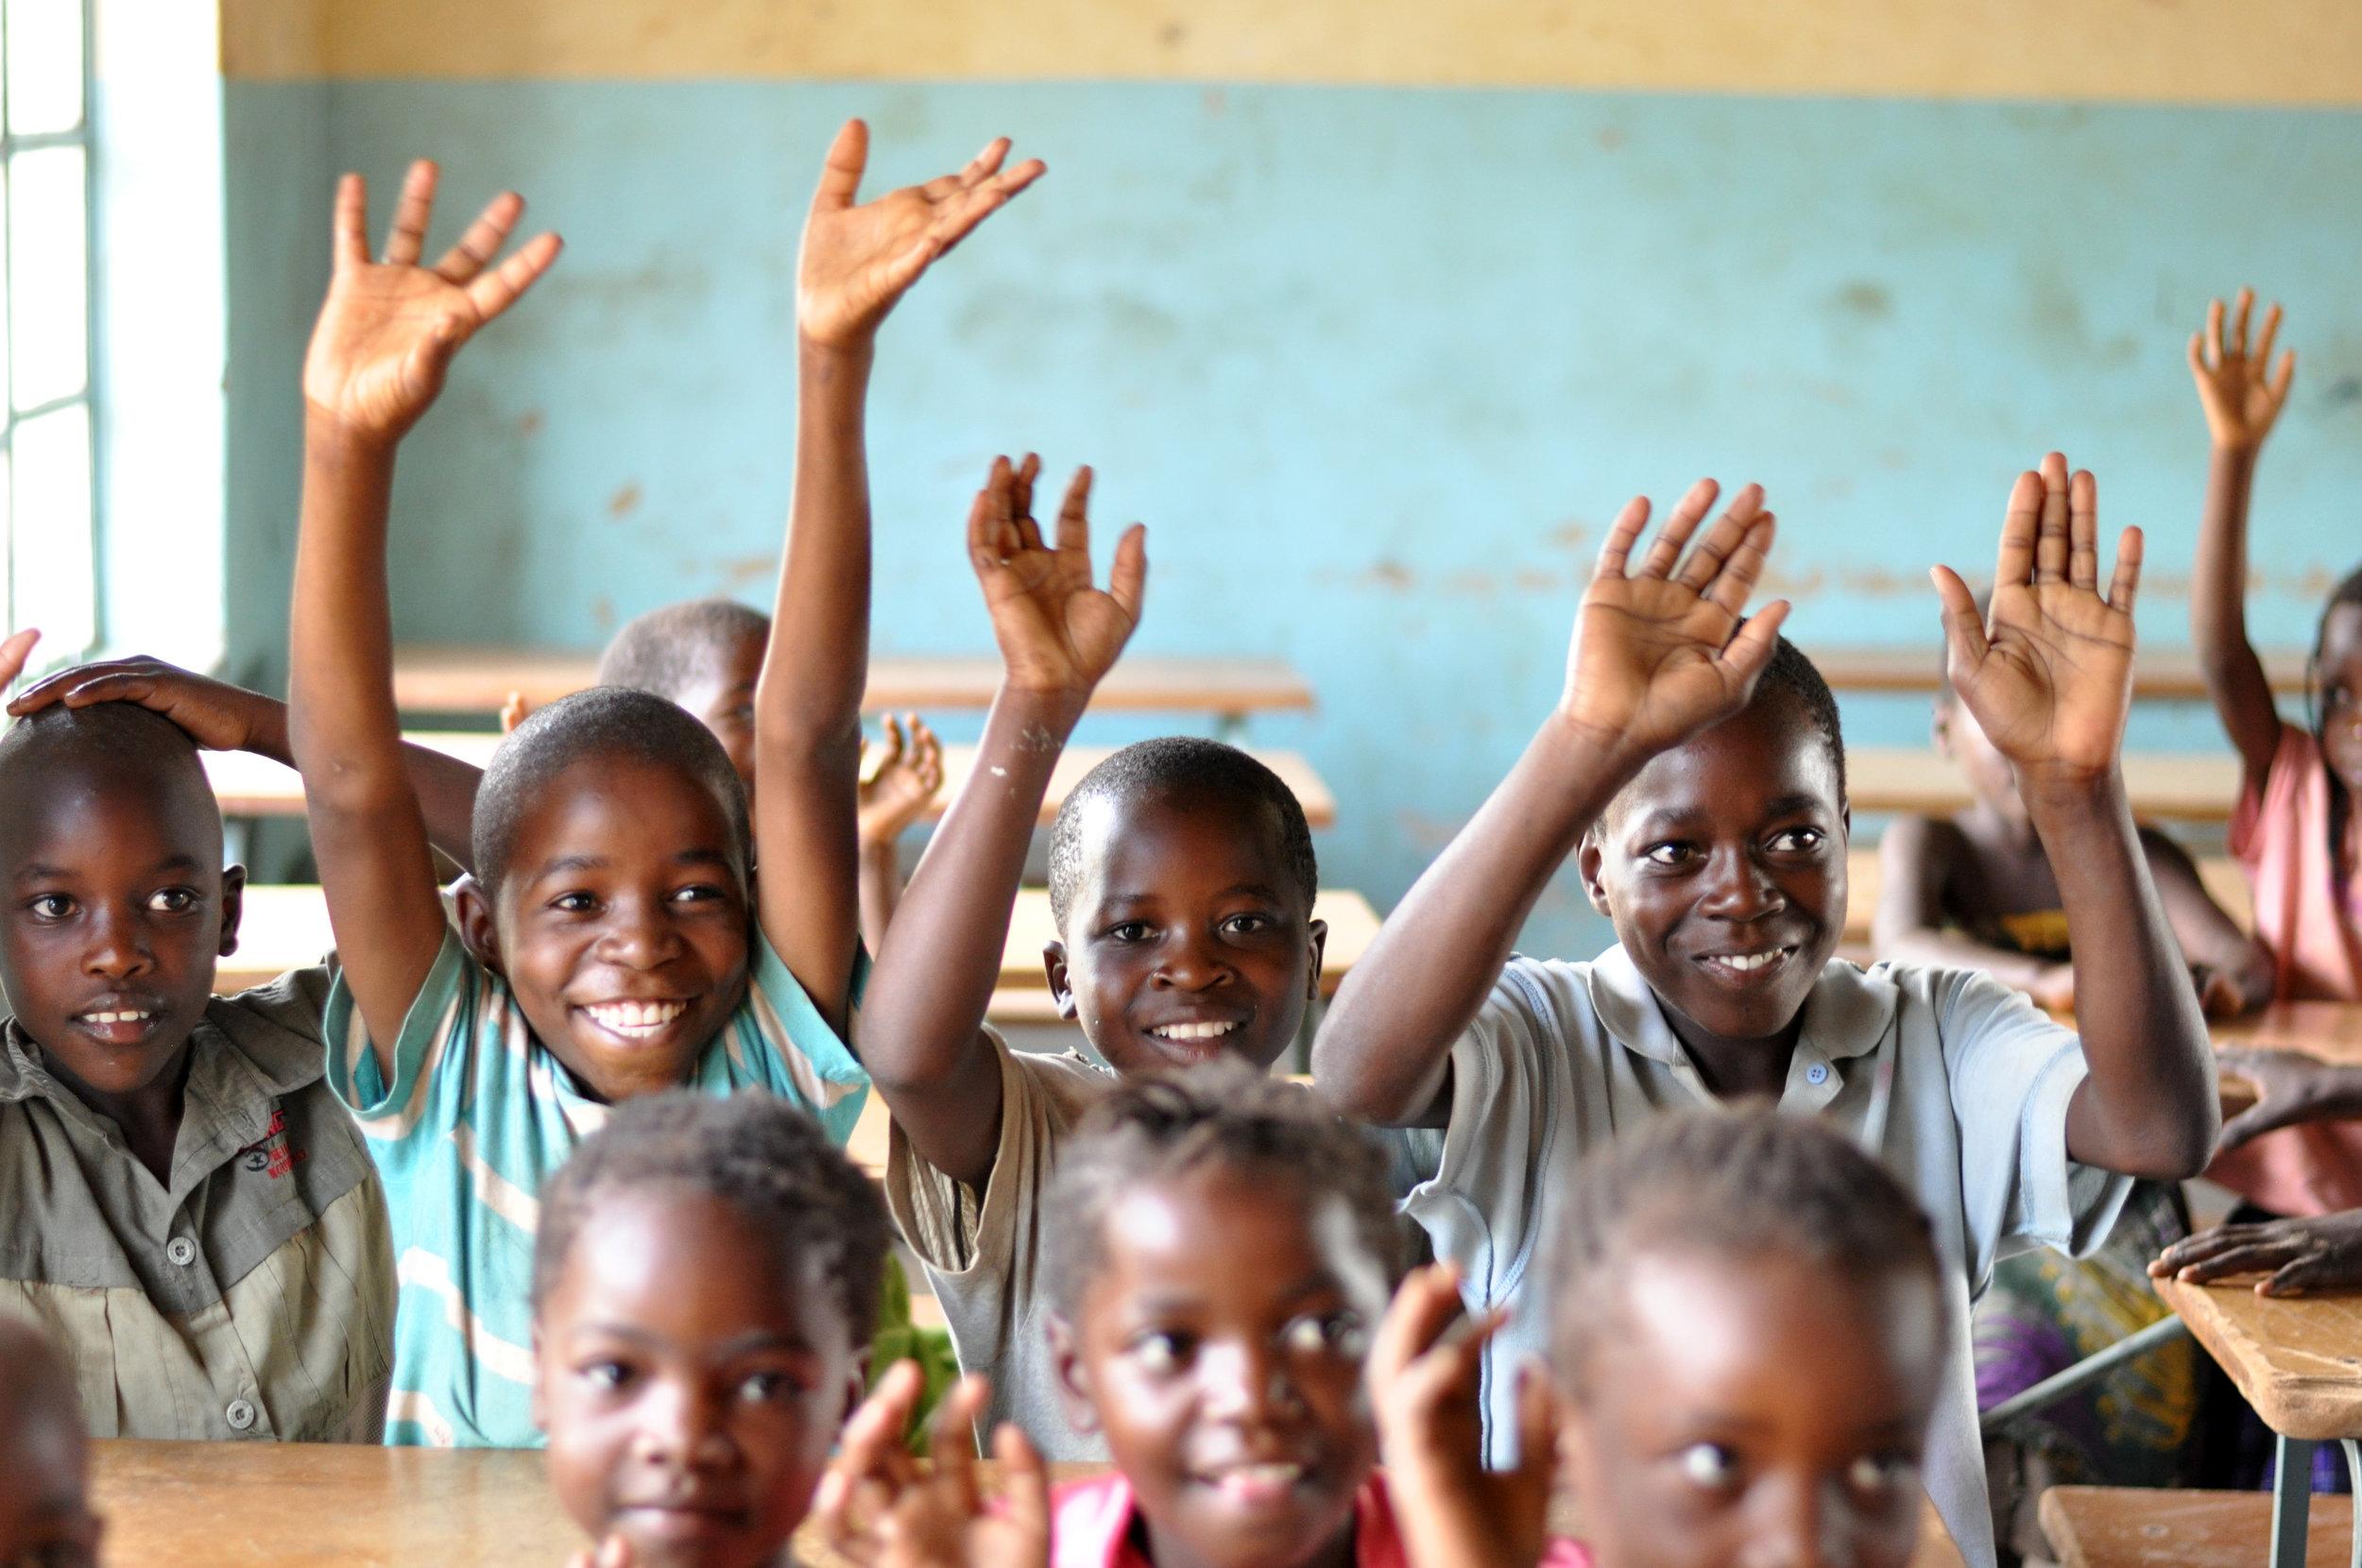 Leanne Gray/FHI 360, USAID Zambia SPLASH Project